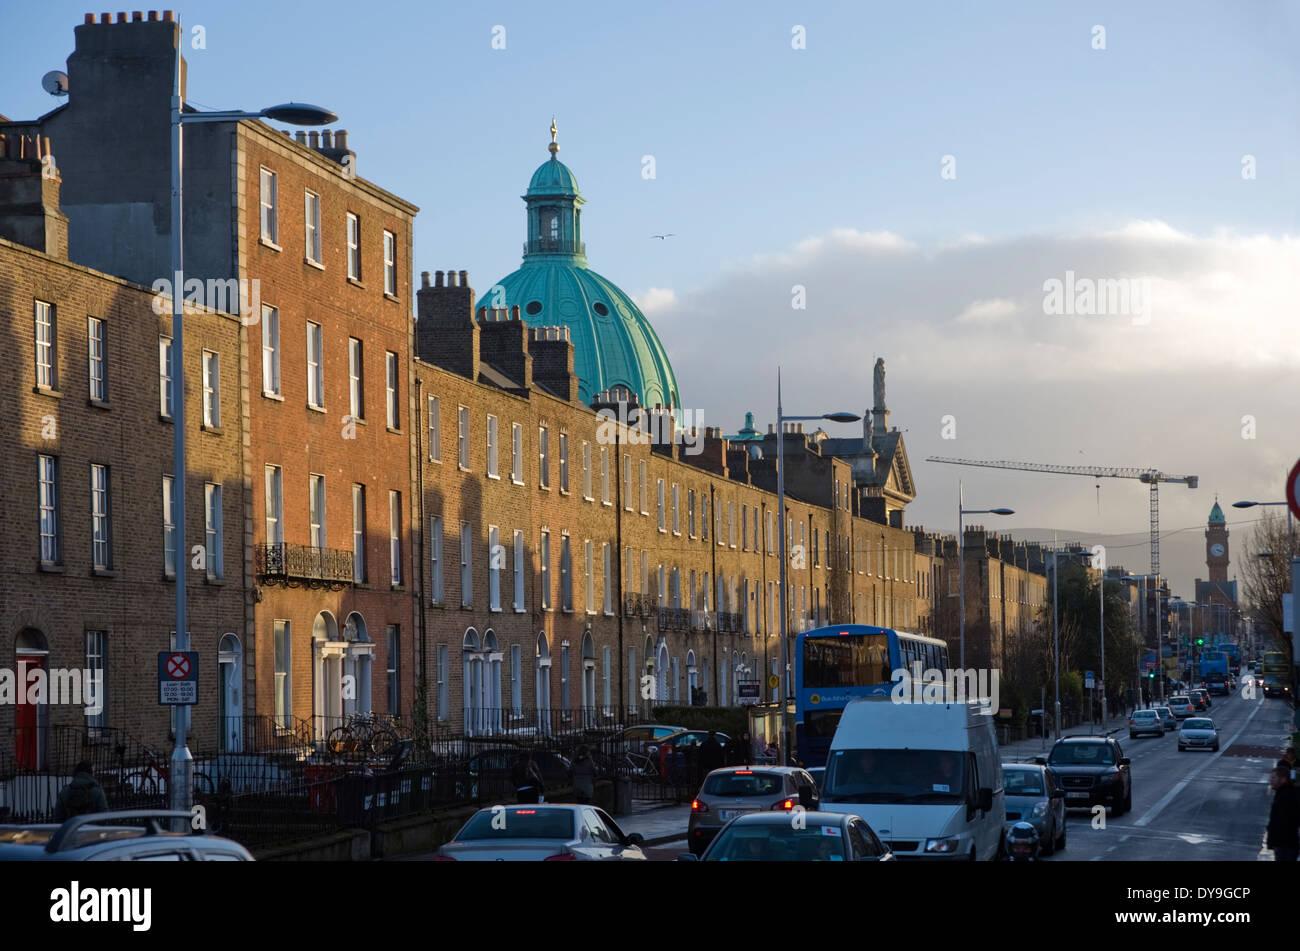 PHOTOGRAPHERS AND STUDIOS IN DUBLIN